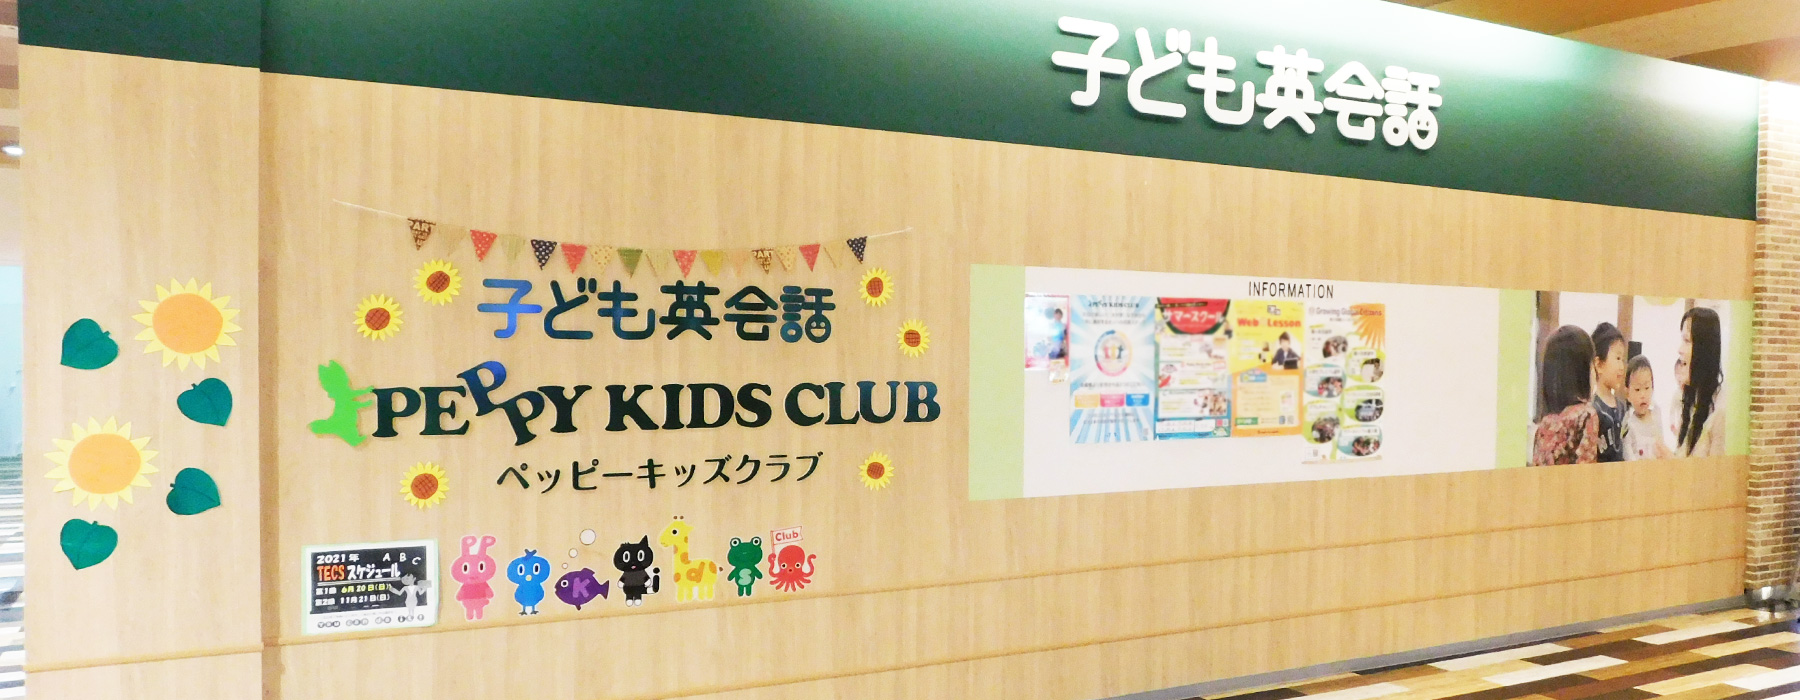 PEPPY KIDS CLUB